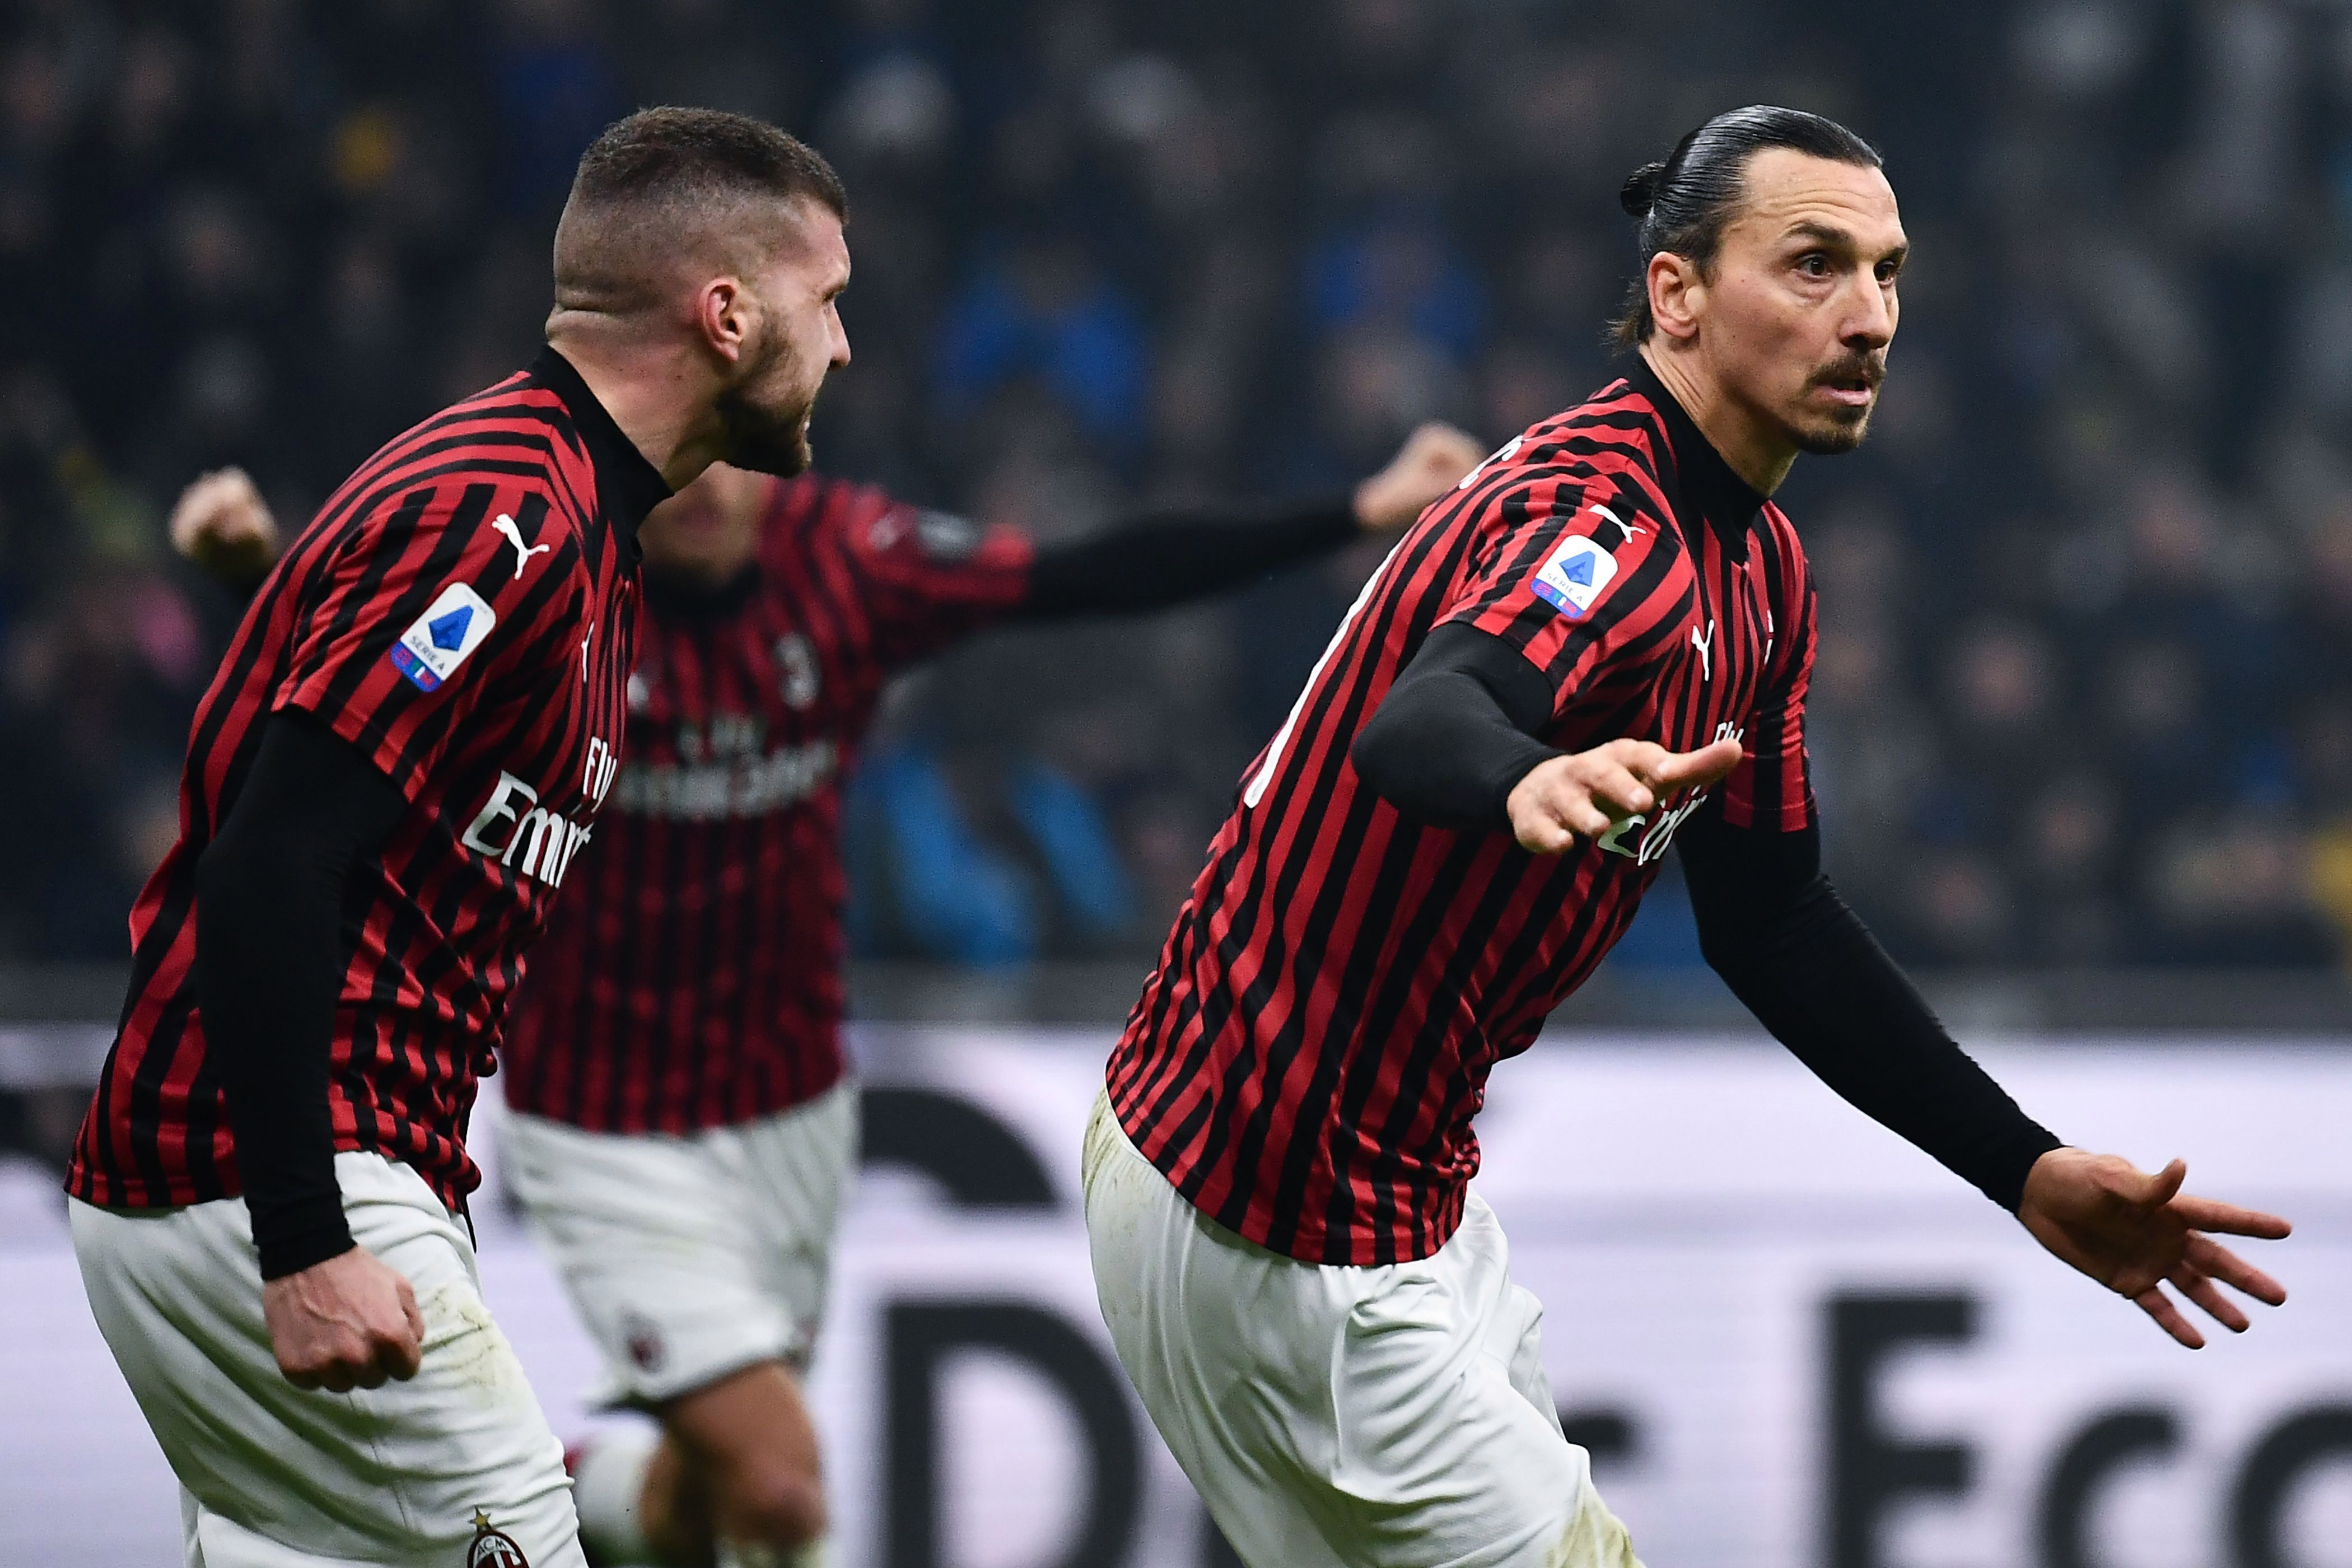 AC Milan vs Juventus live stream How to watch Ibrahimovic